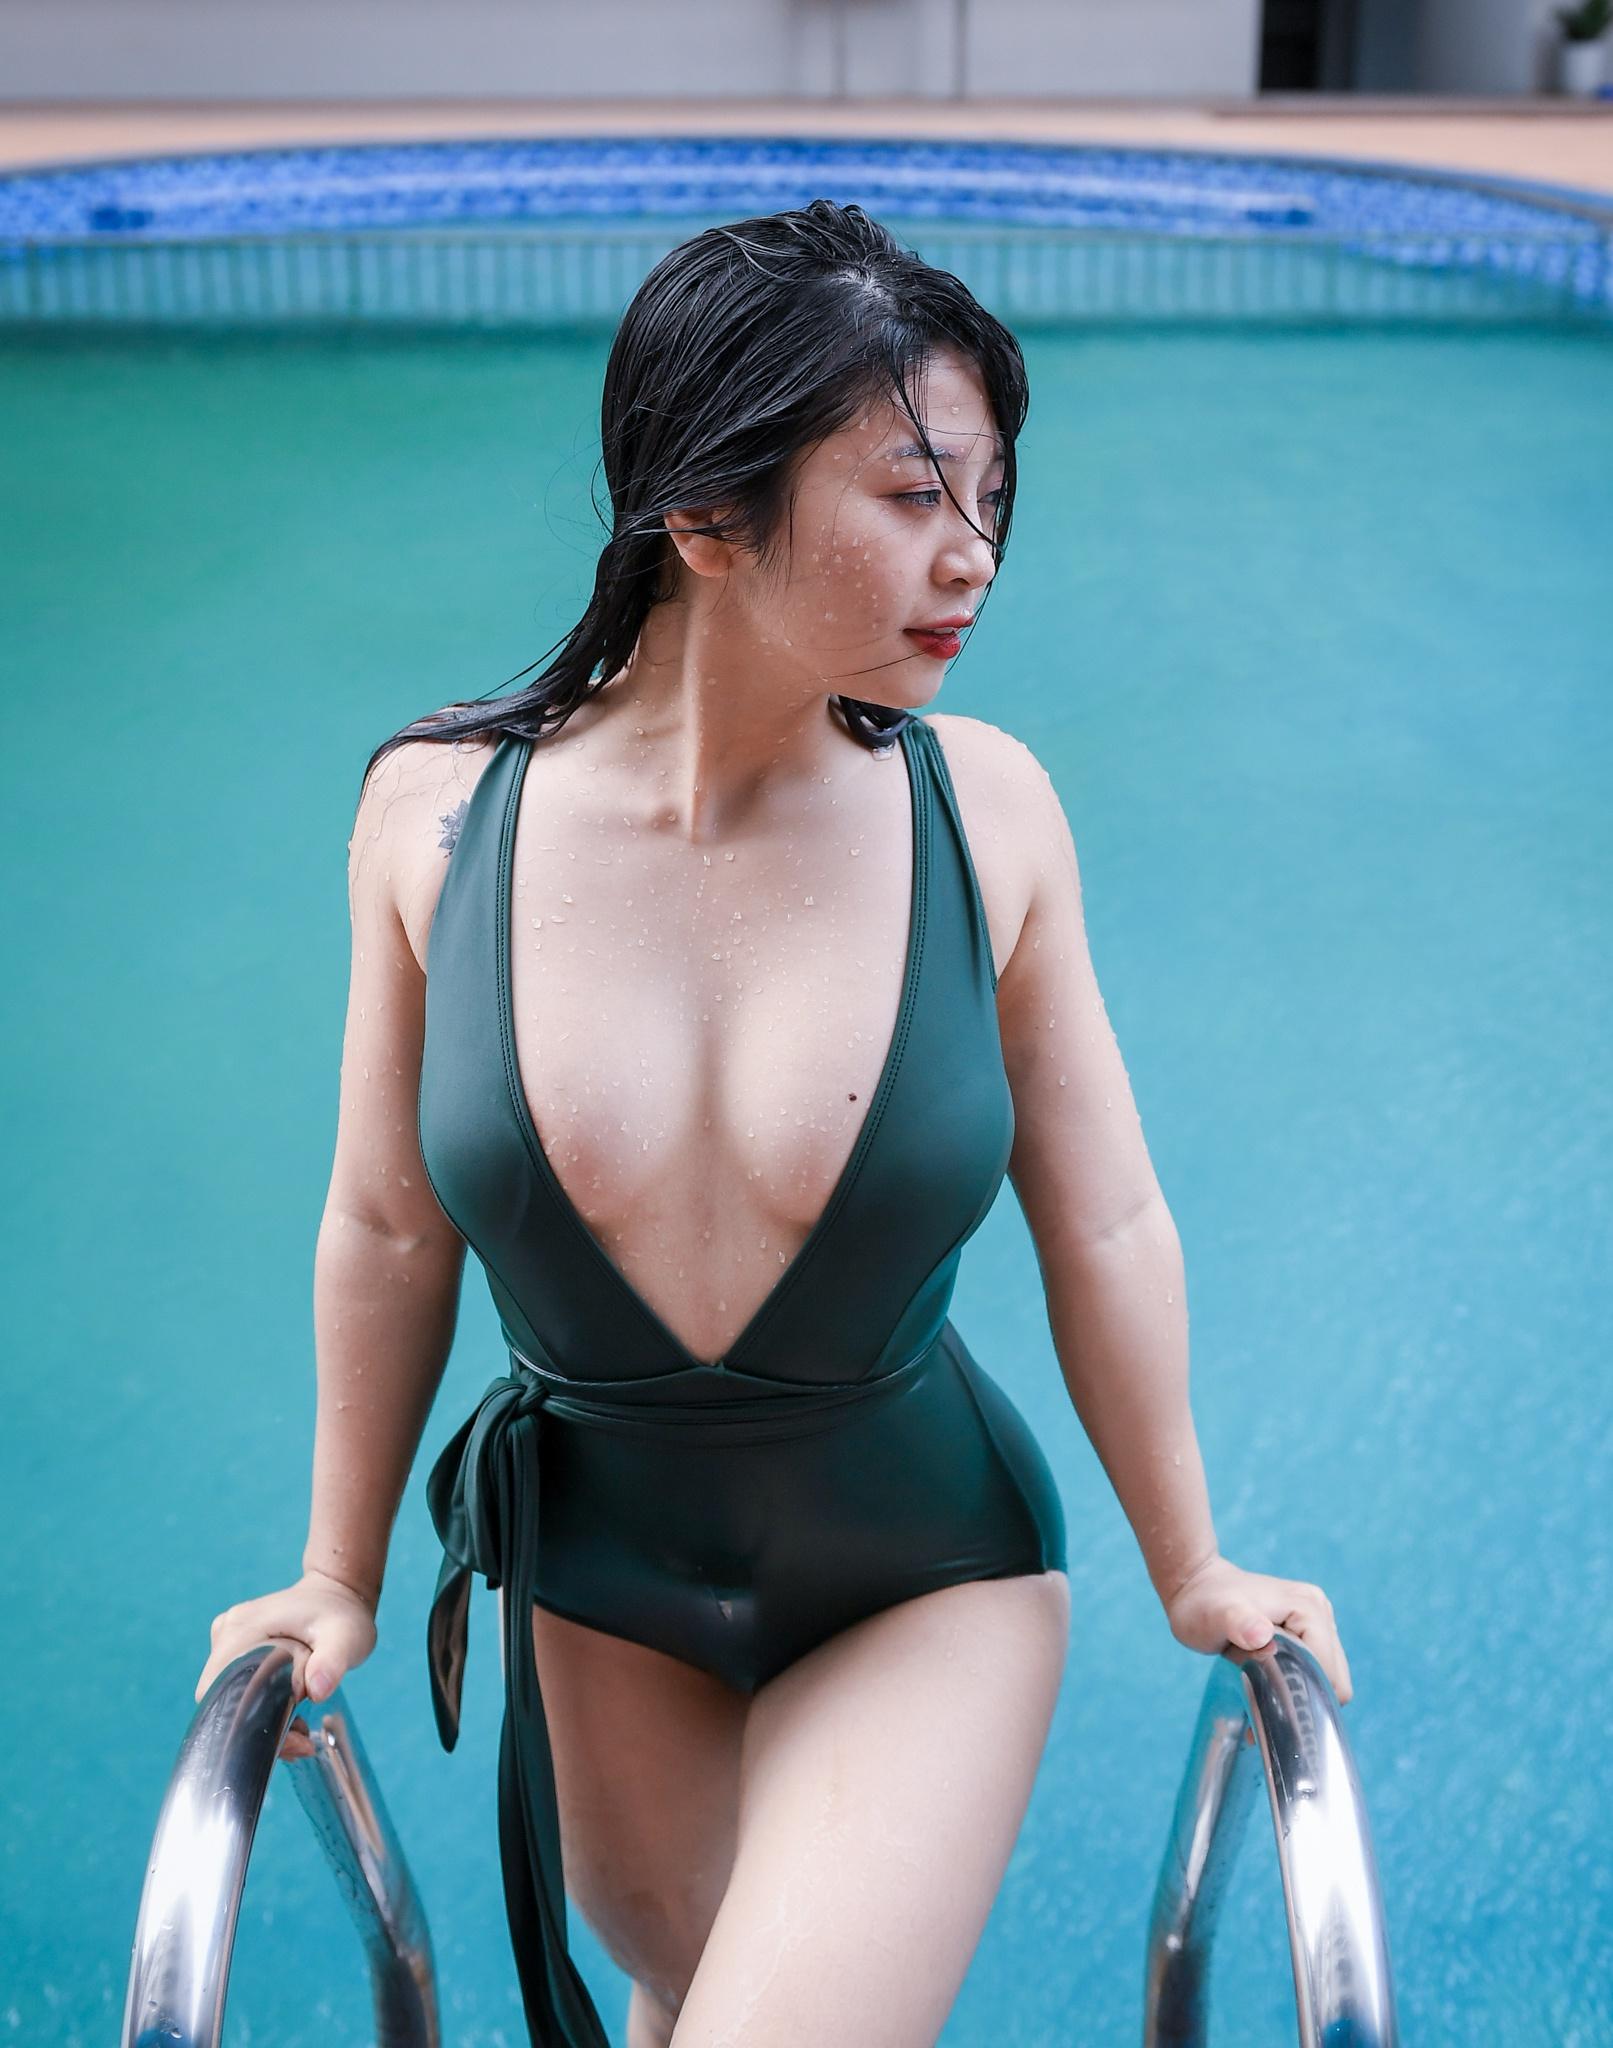 Hot girl mua con so khong ai yeu vi qua manh me hinh anh 34 36_hot_girl_mua_con_zing50.jpg